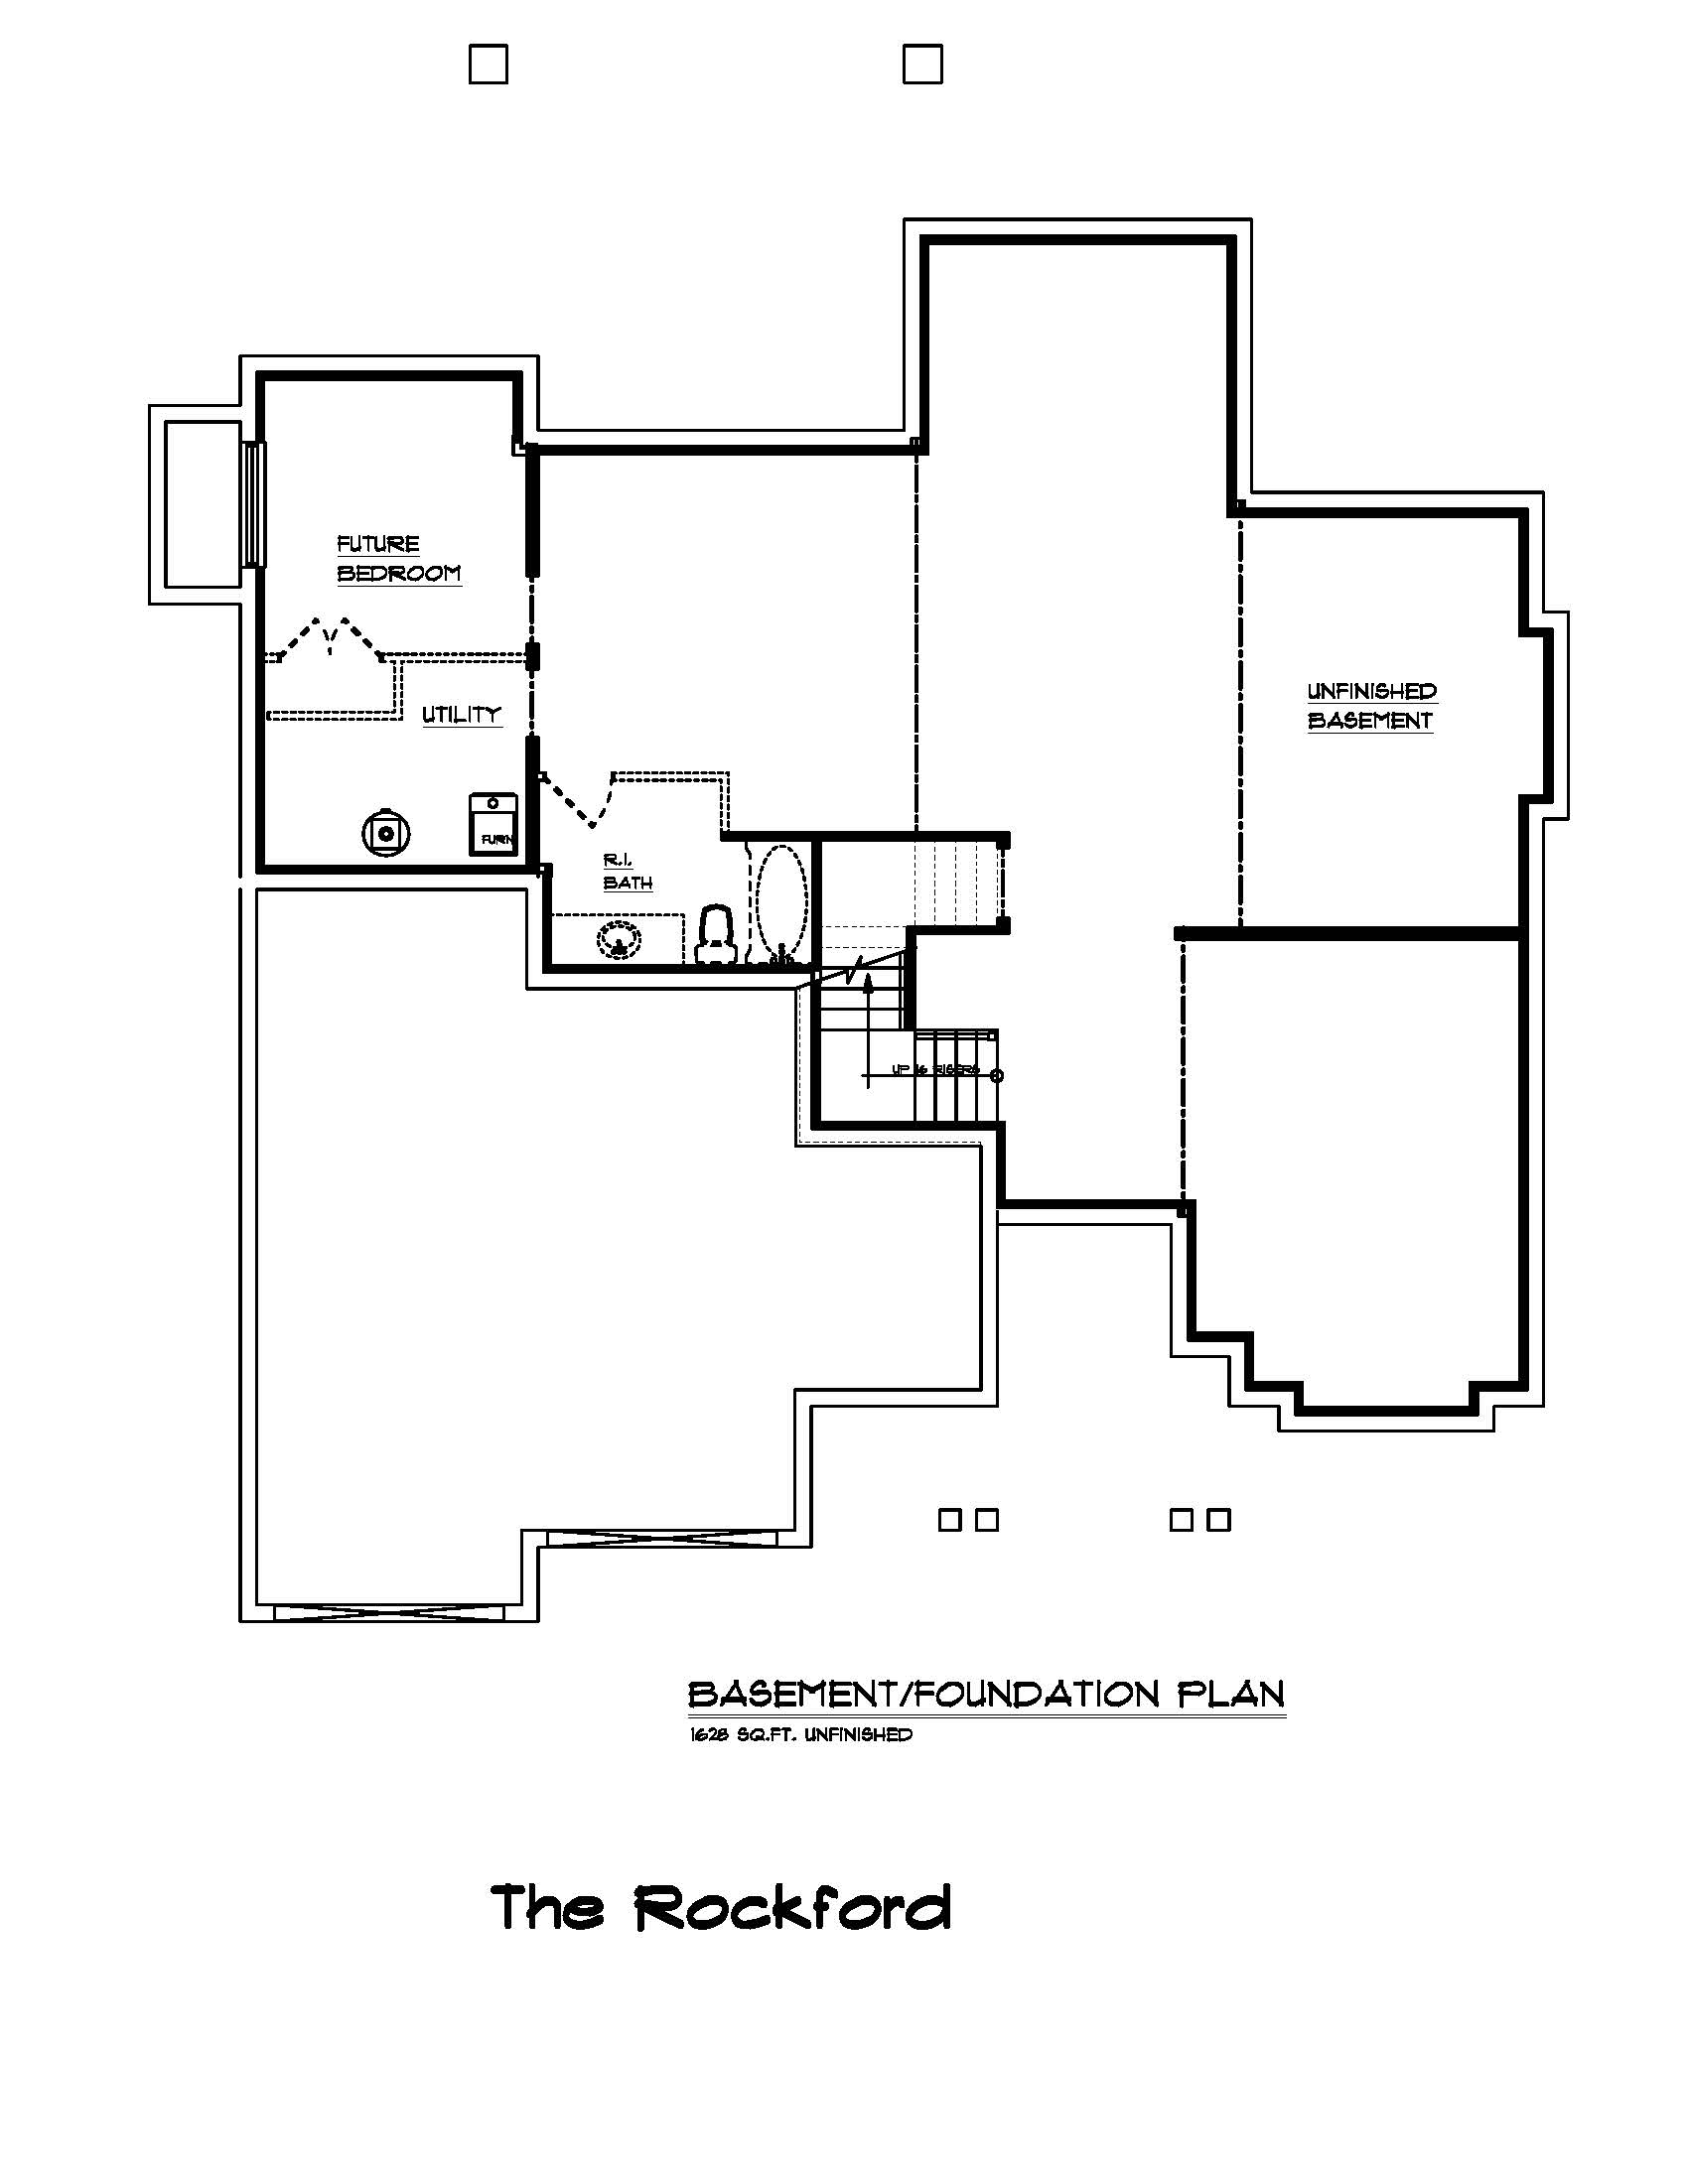 The Rockford - Custom Home Floor Plan 4